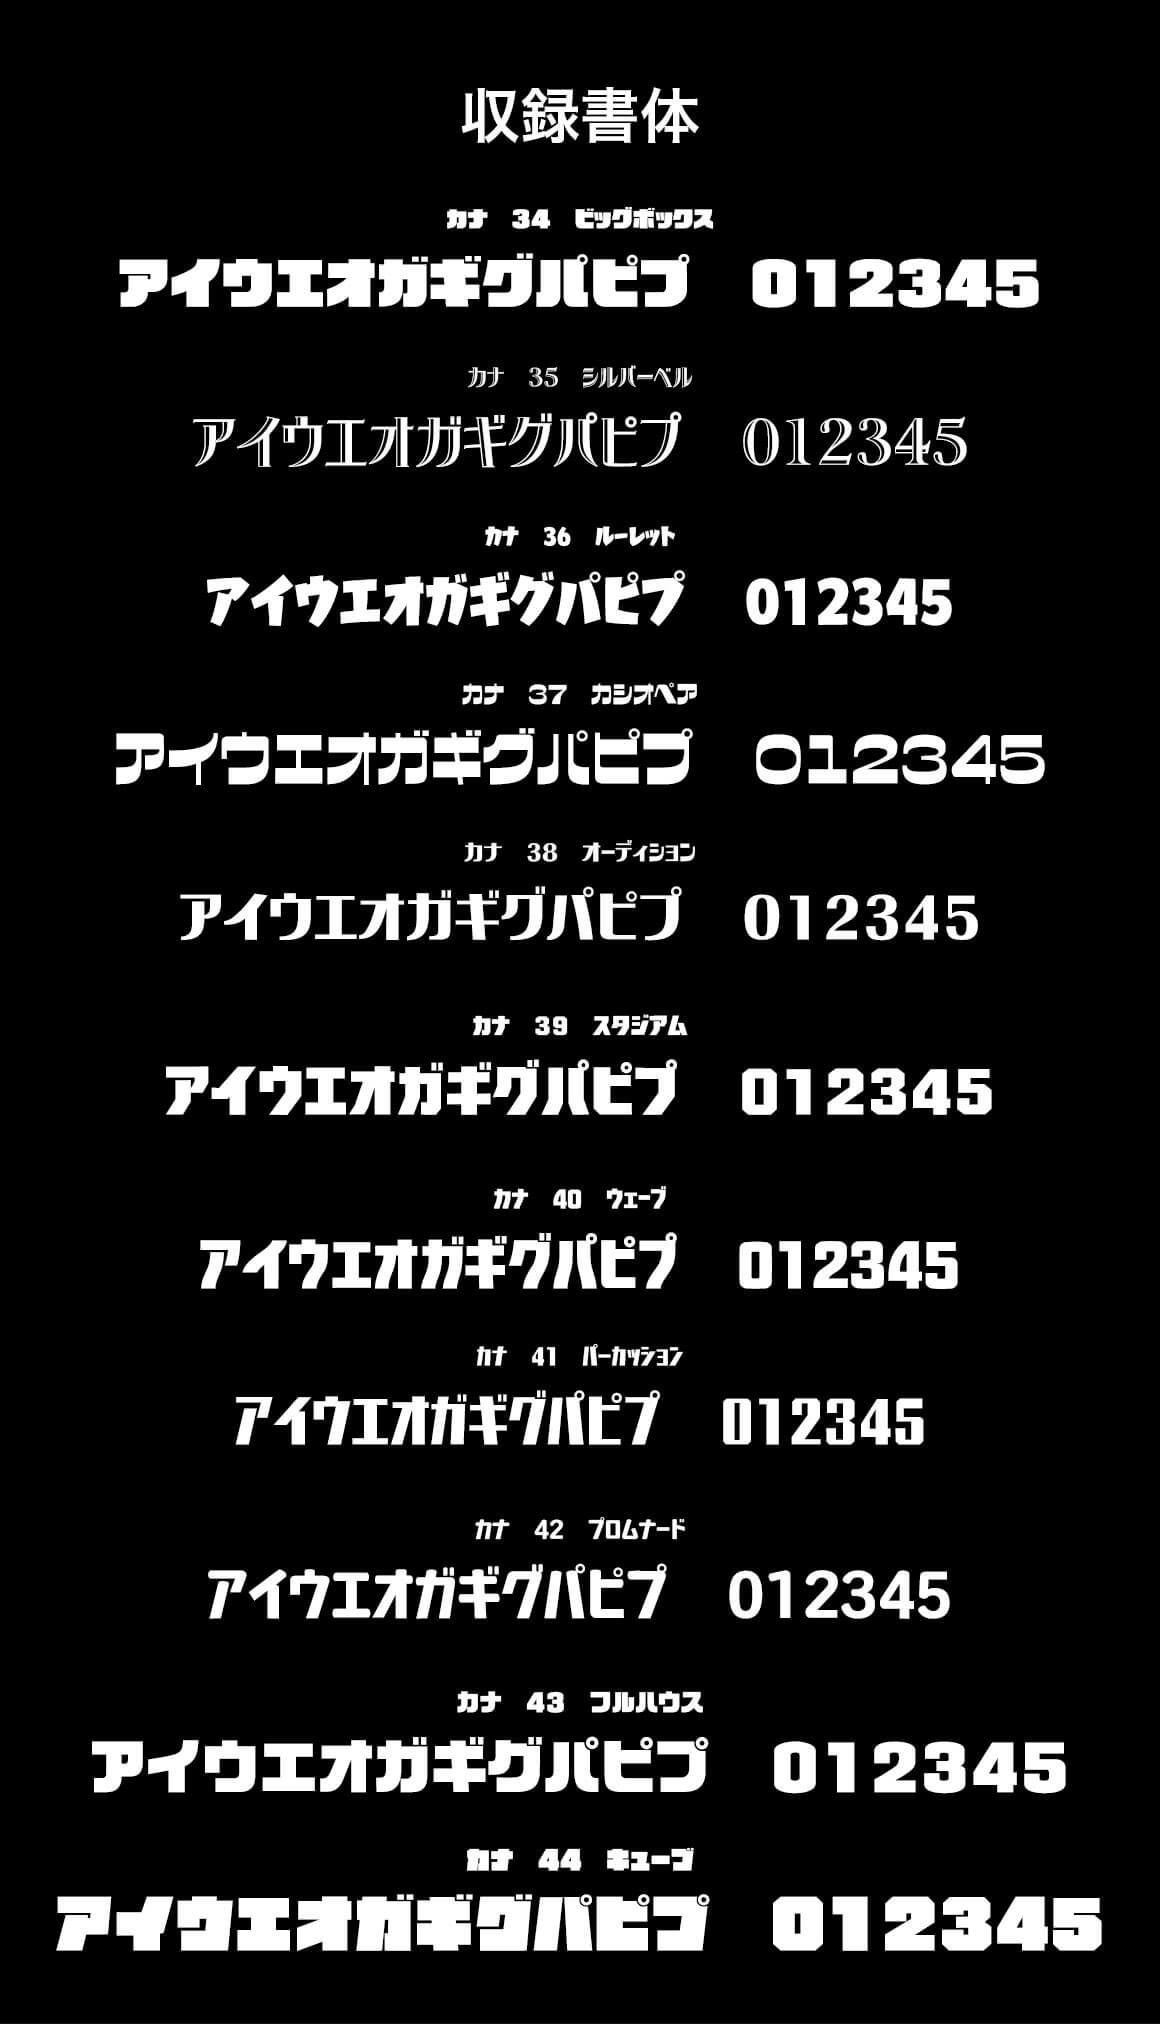 letterform-the-versatile-japanese-fonts-collection-4